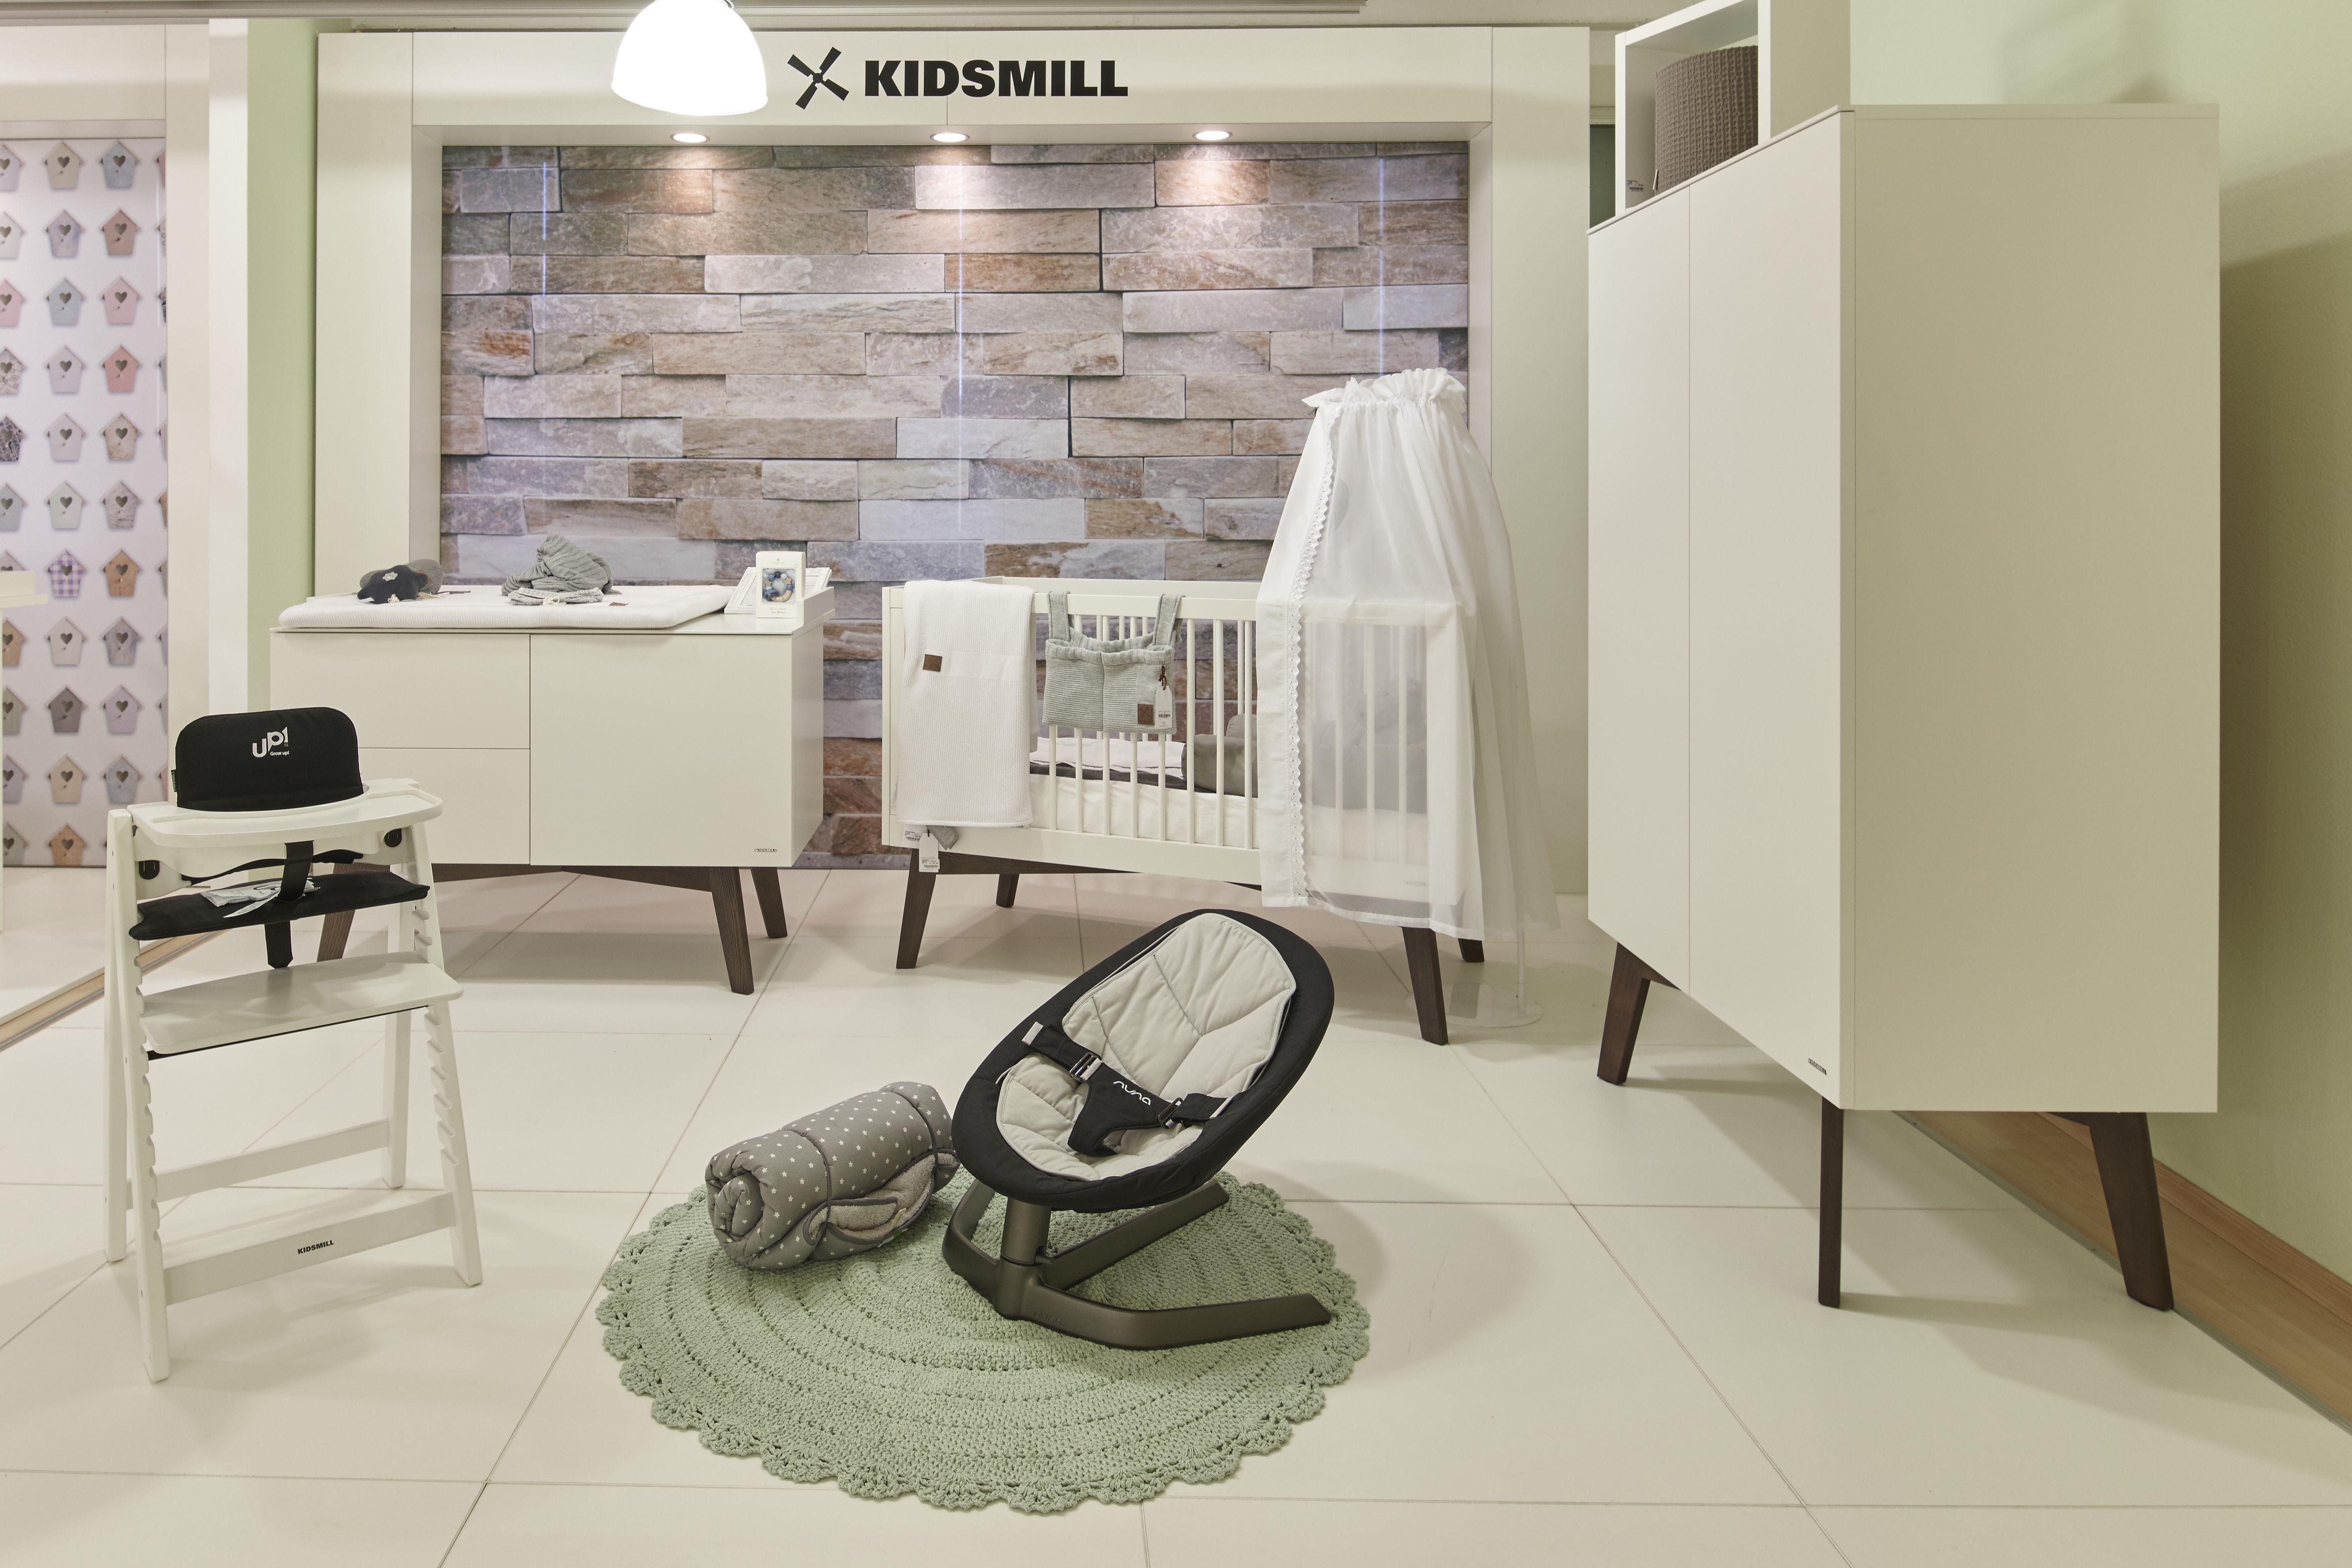 Inspirational f r jeden Geschmack das Passende dabei garantiert Bei ber liebevoll dekorierten Kinderzimmer bei